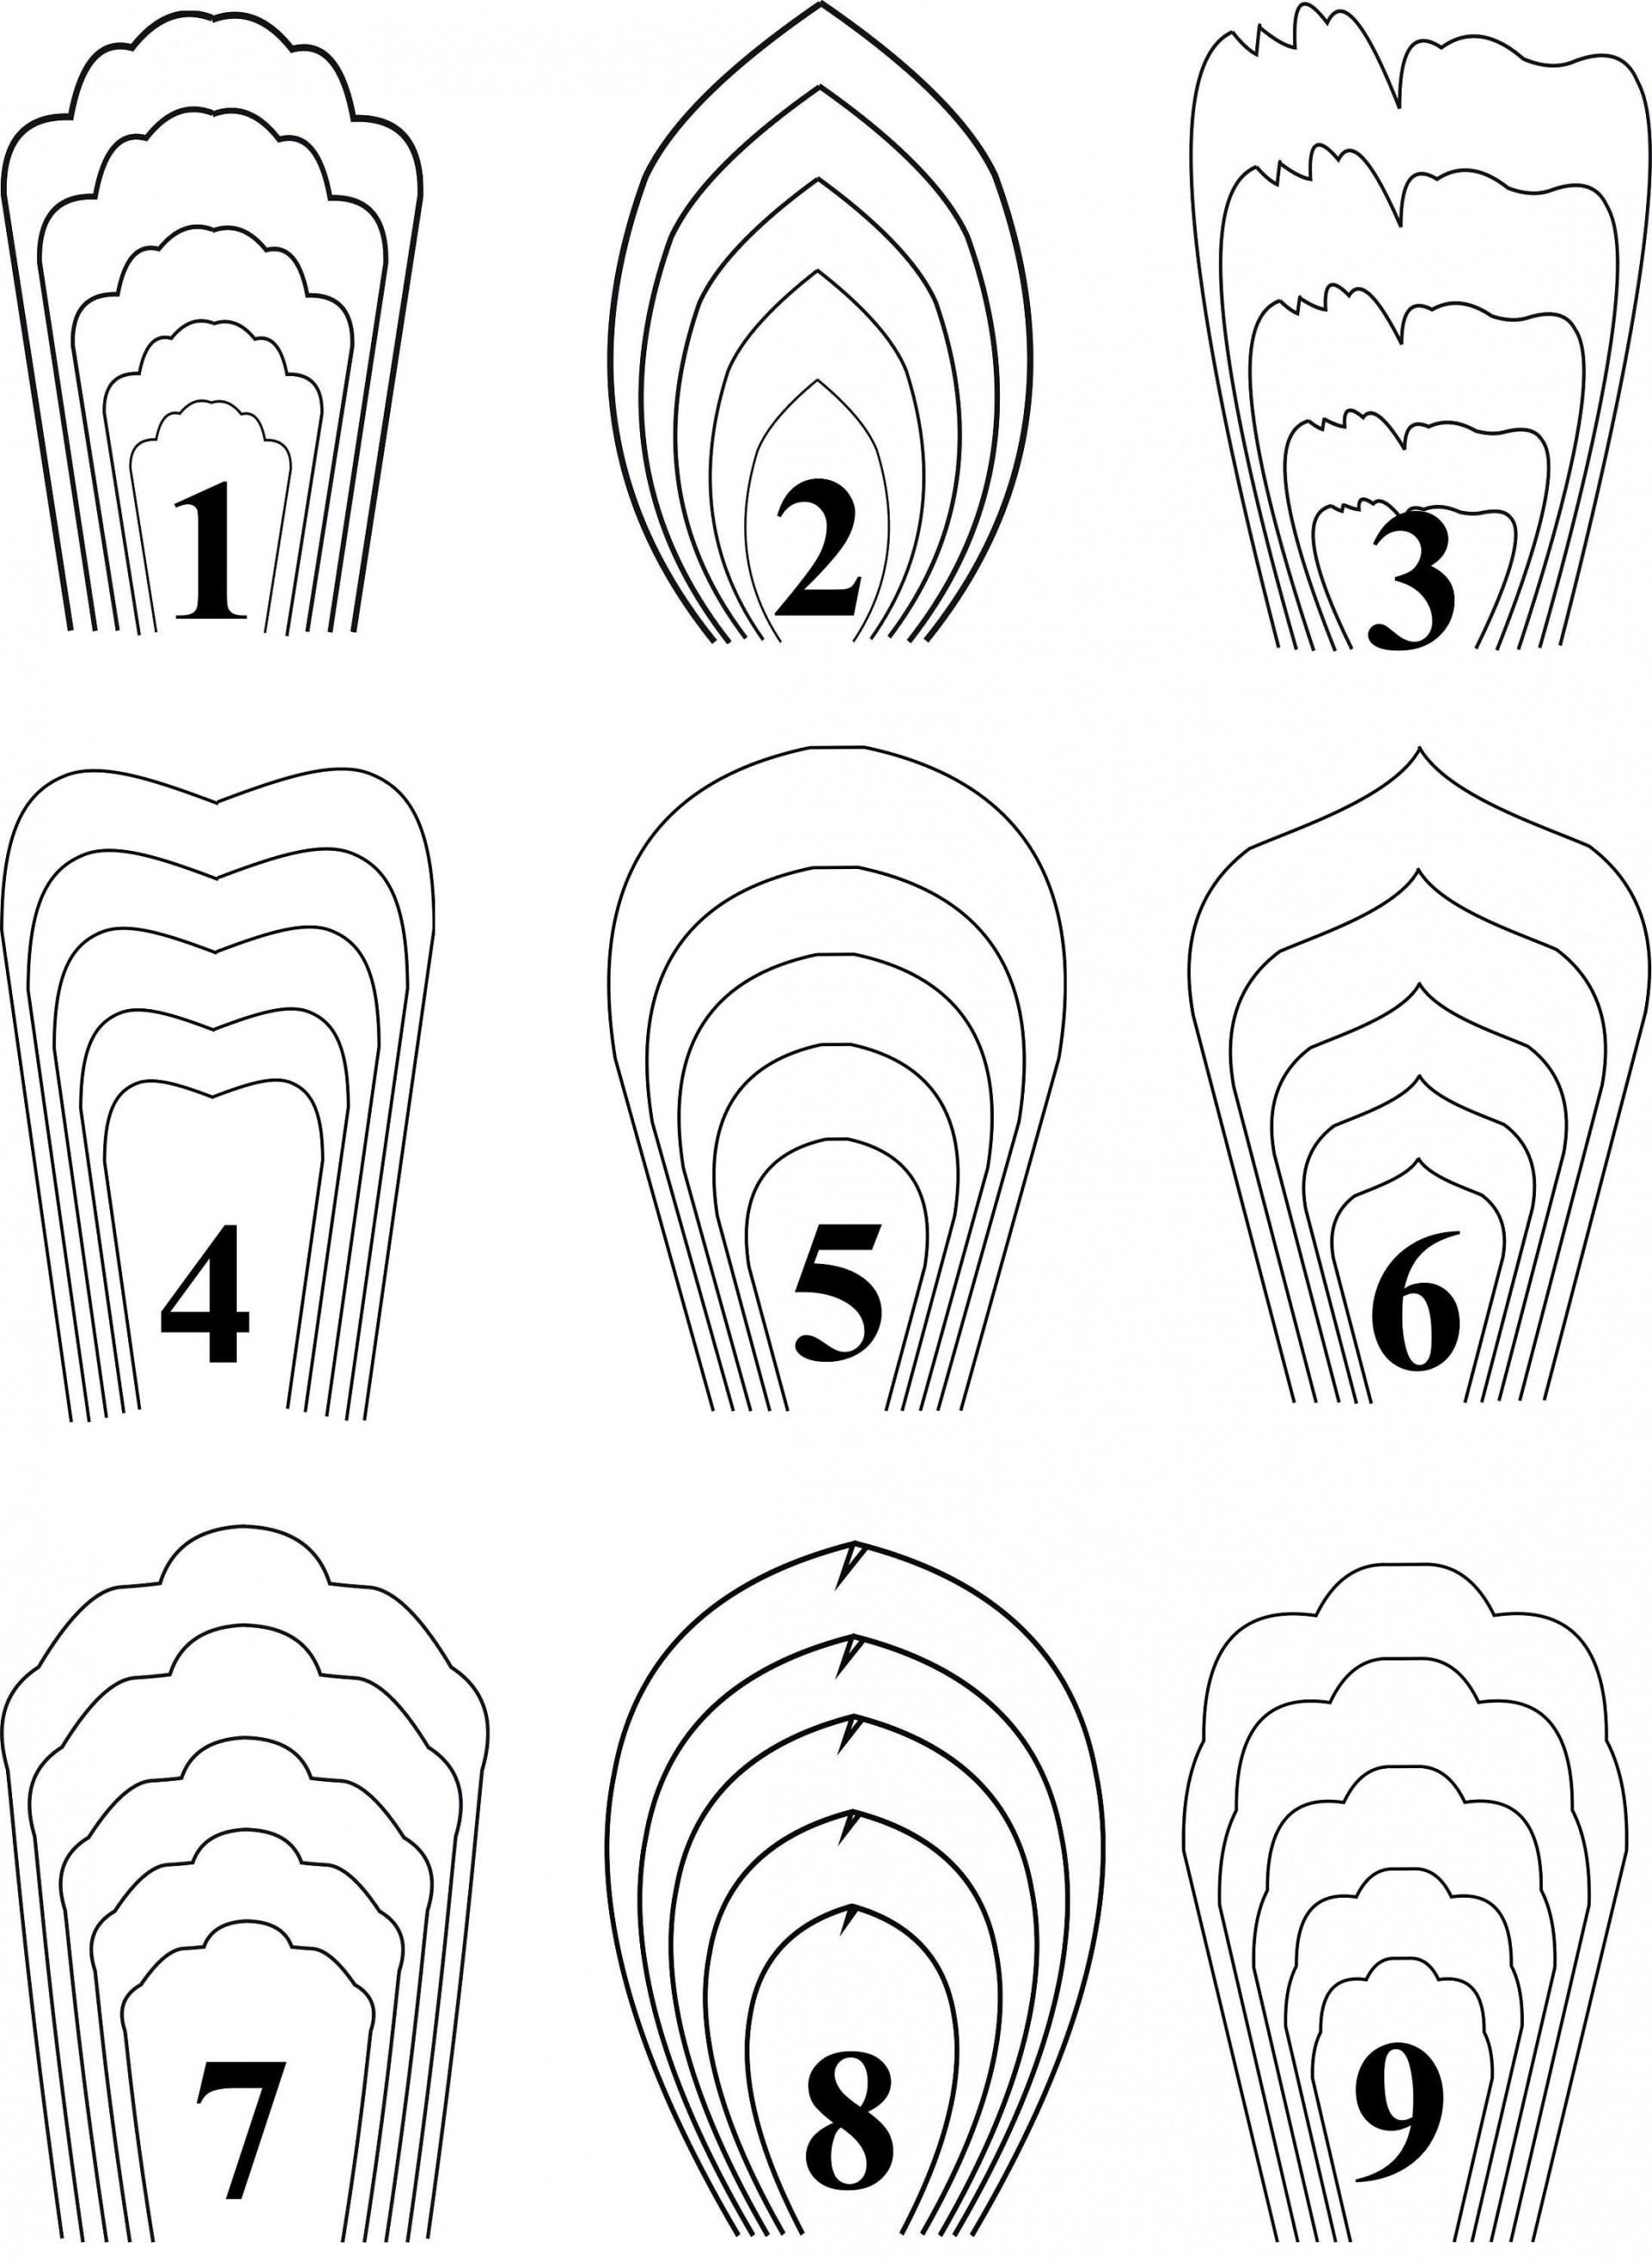 001 Template Ideas Paper Flower Templates Sensational Free Backdrop - Free Paper Flower Templates Printable